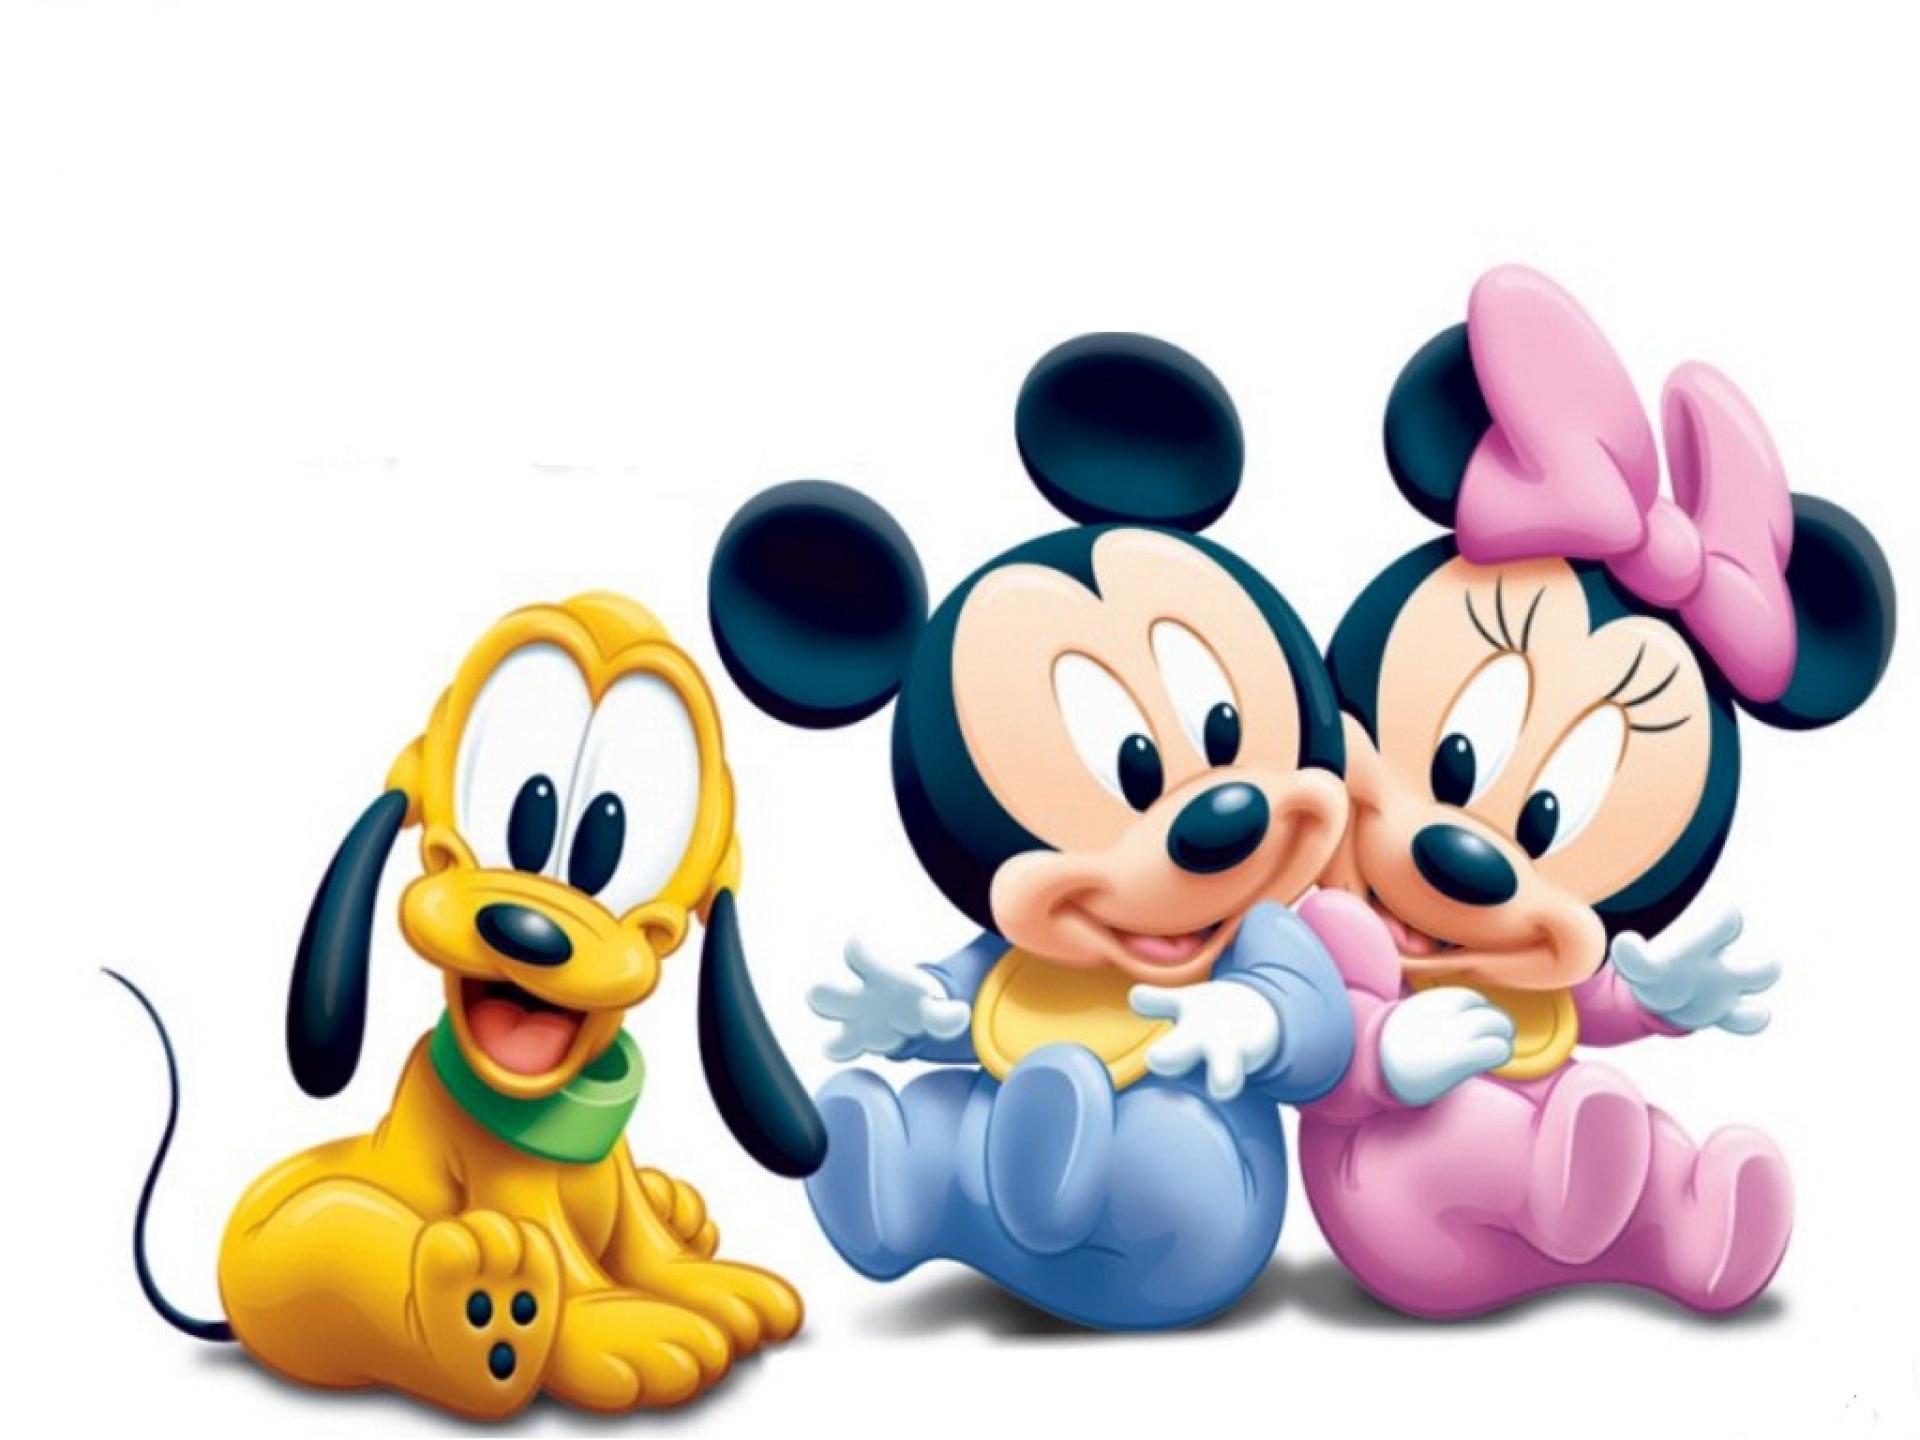 1920x1440 Minnie Mouse Clip Art Image Free